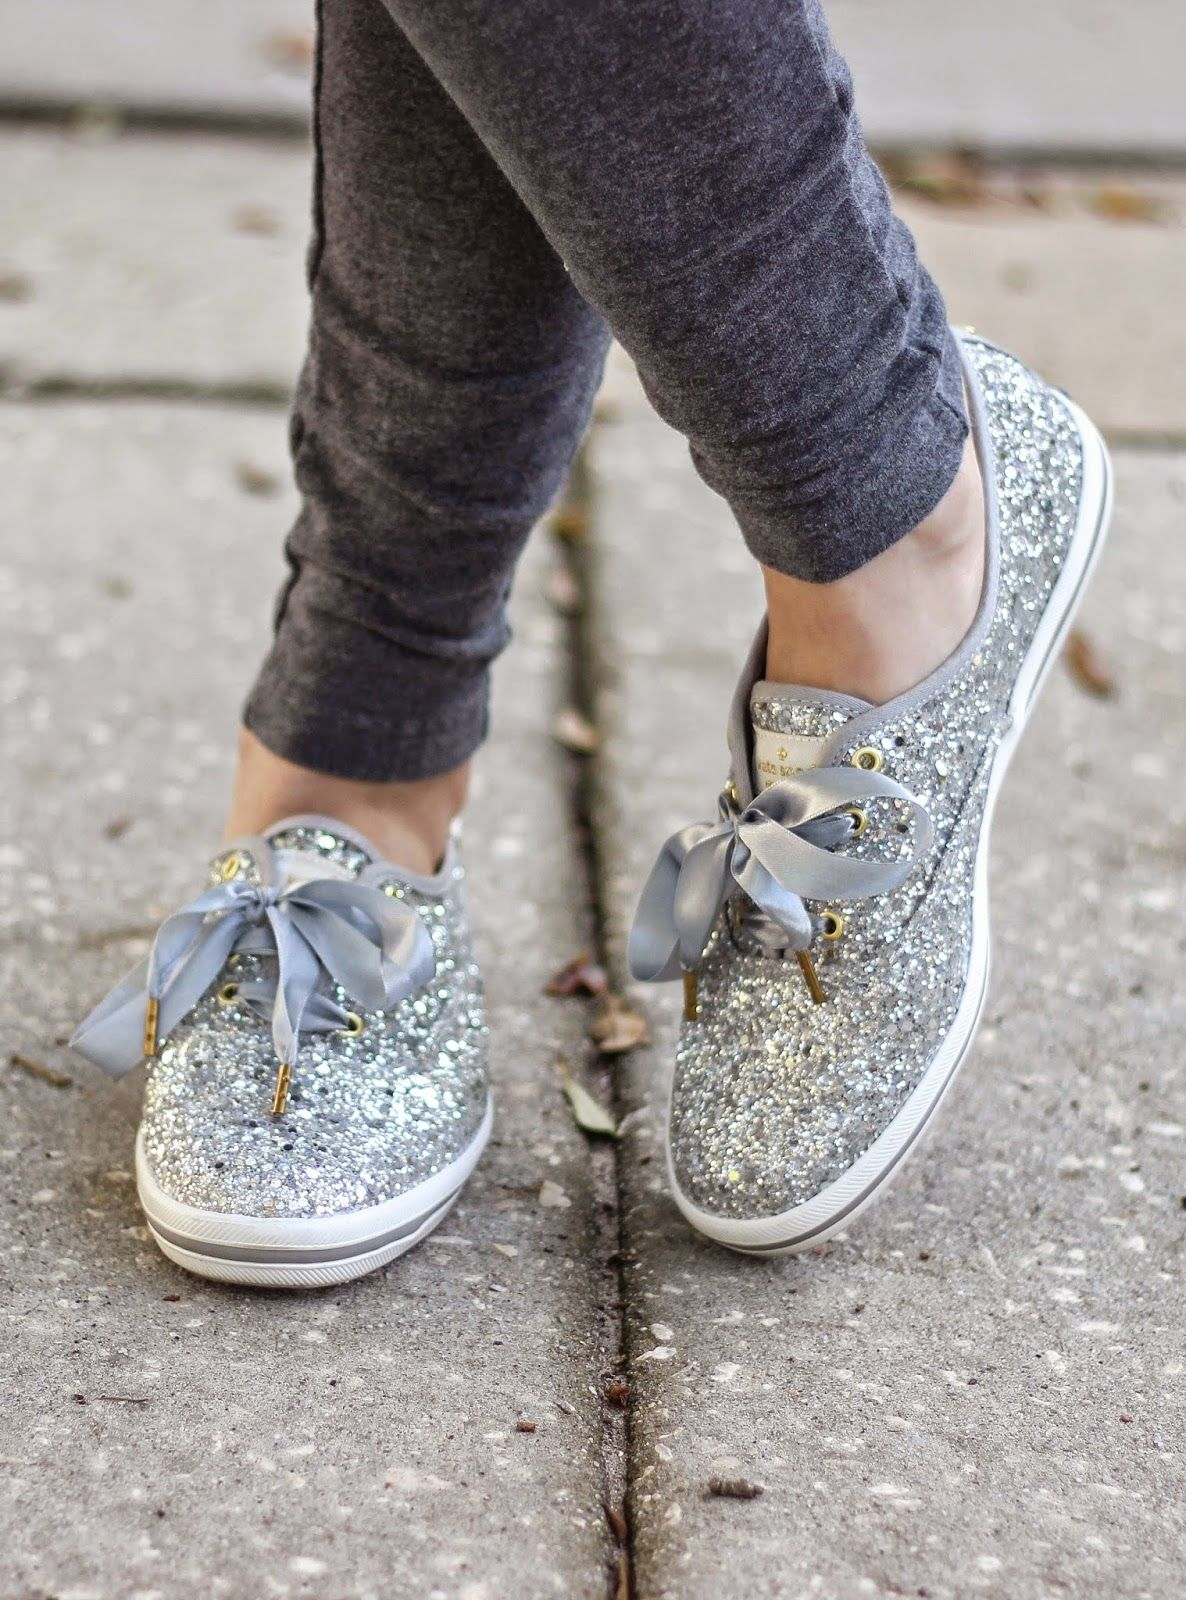 keds kate spade glitter shoes